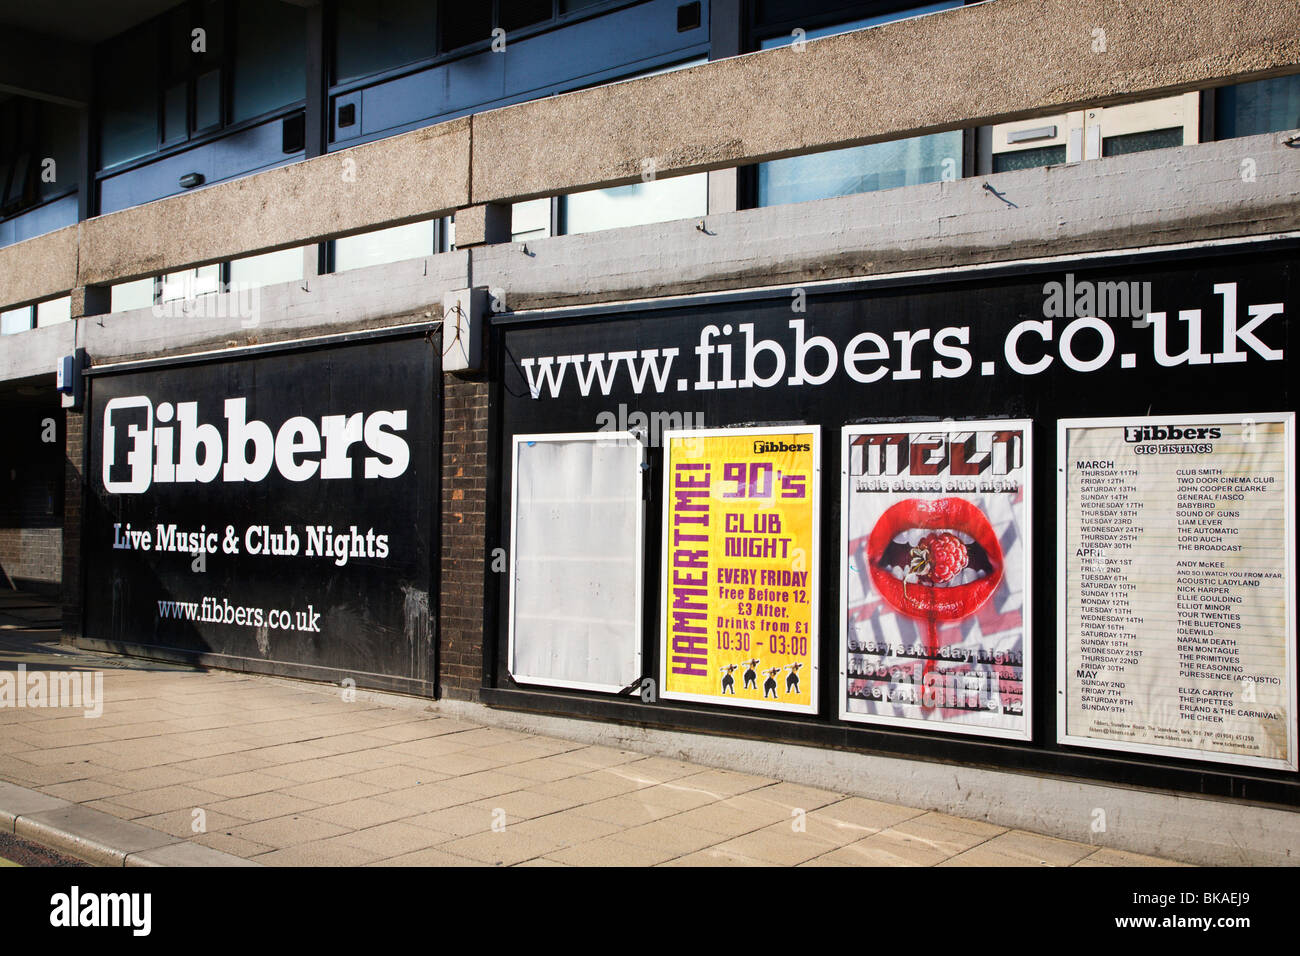 Fibbers Live Music Venue York Yorkshire UK - Stock Image